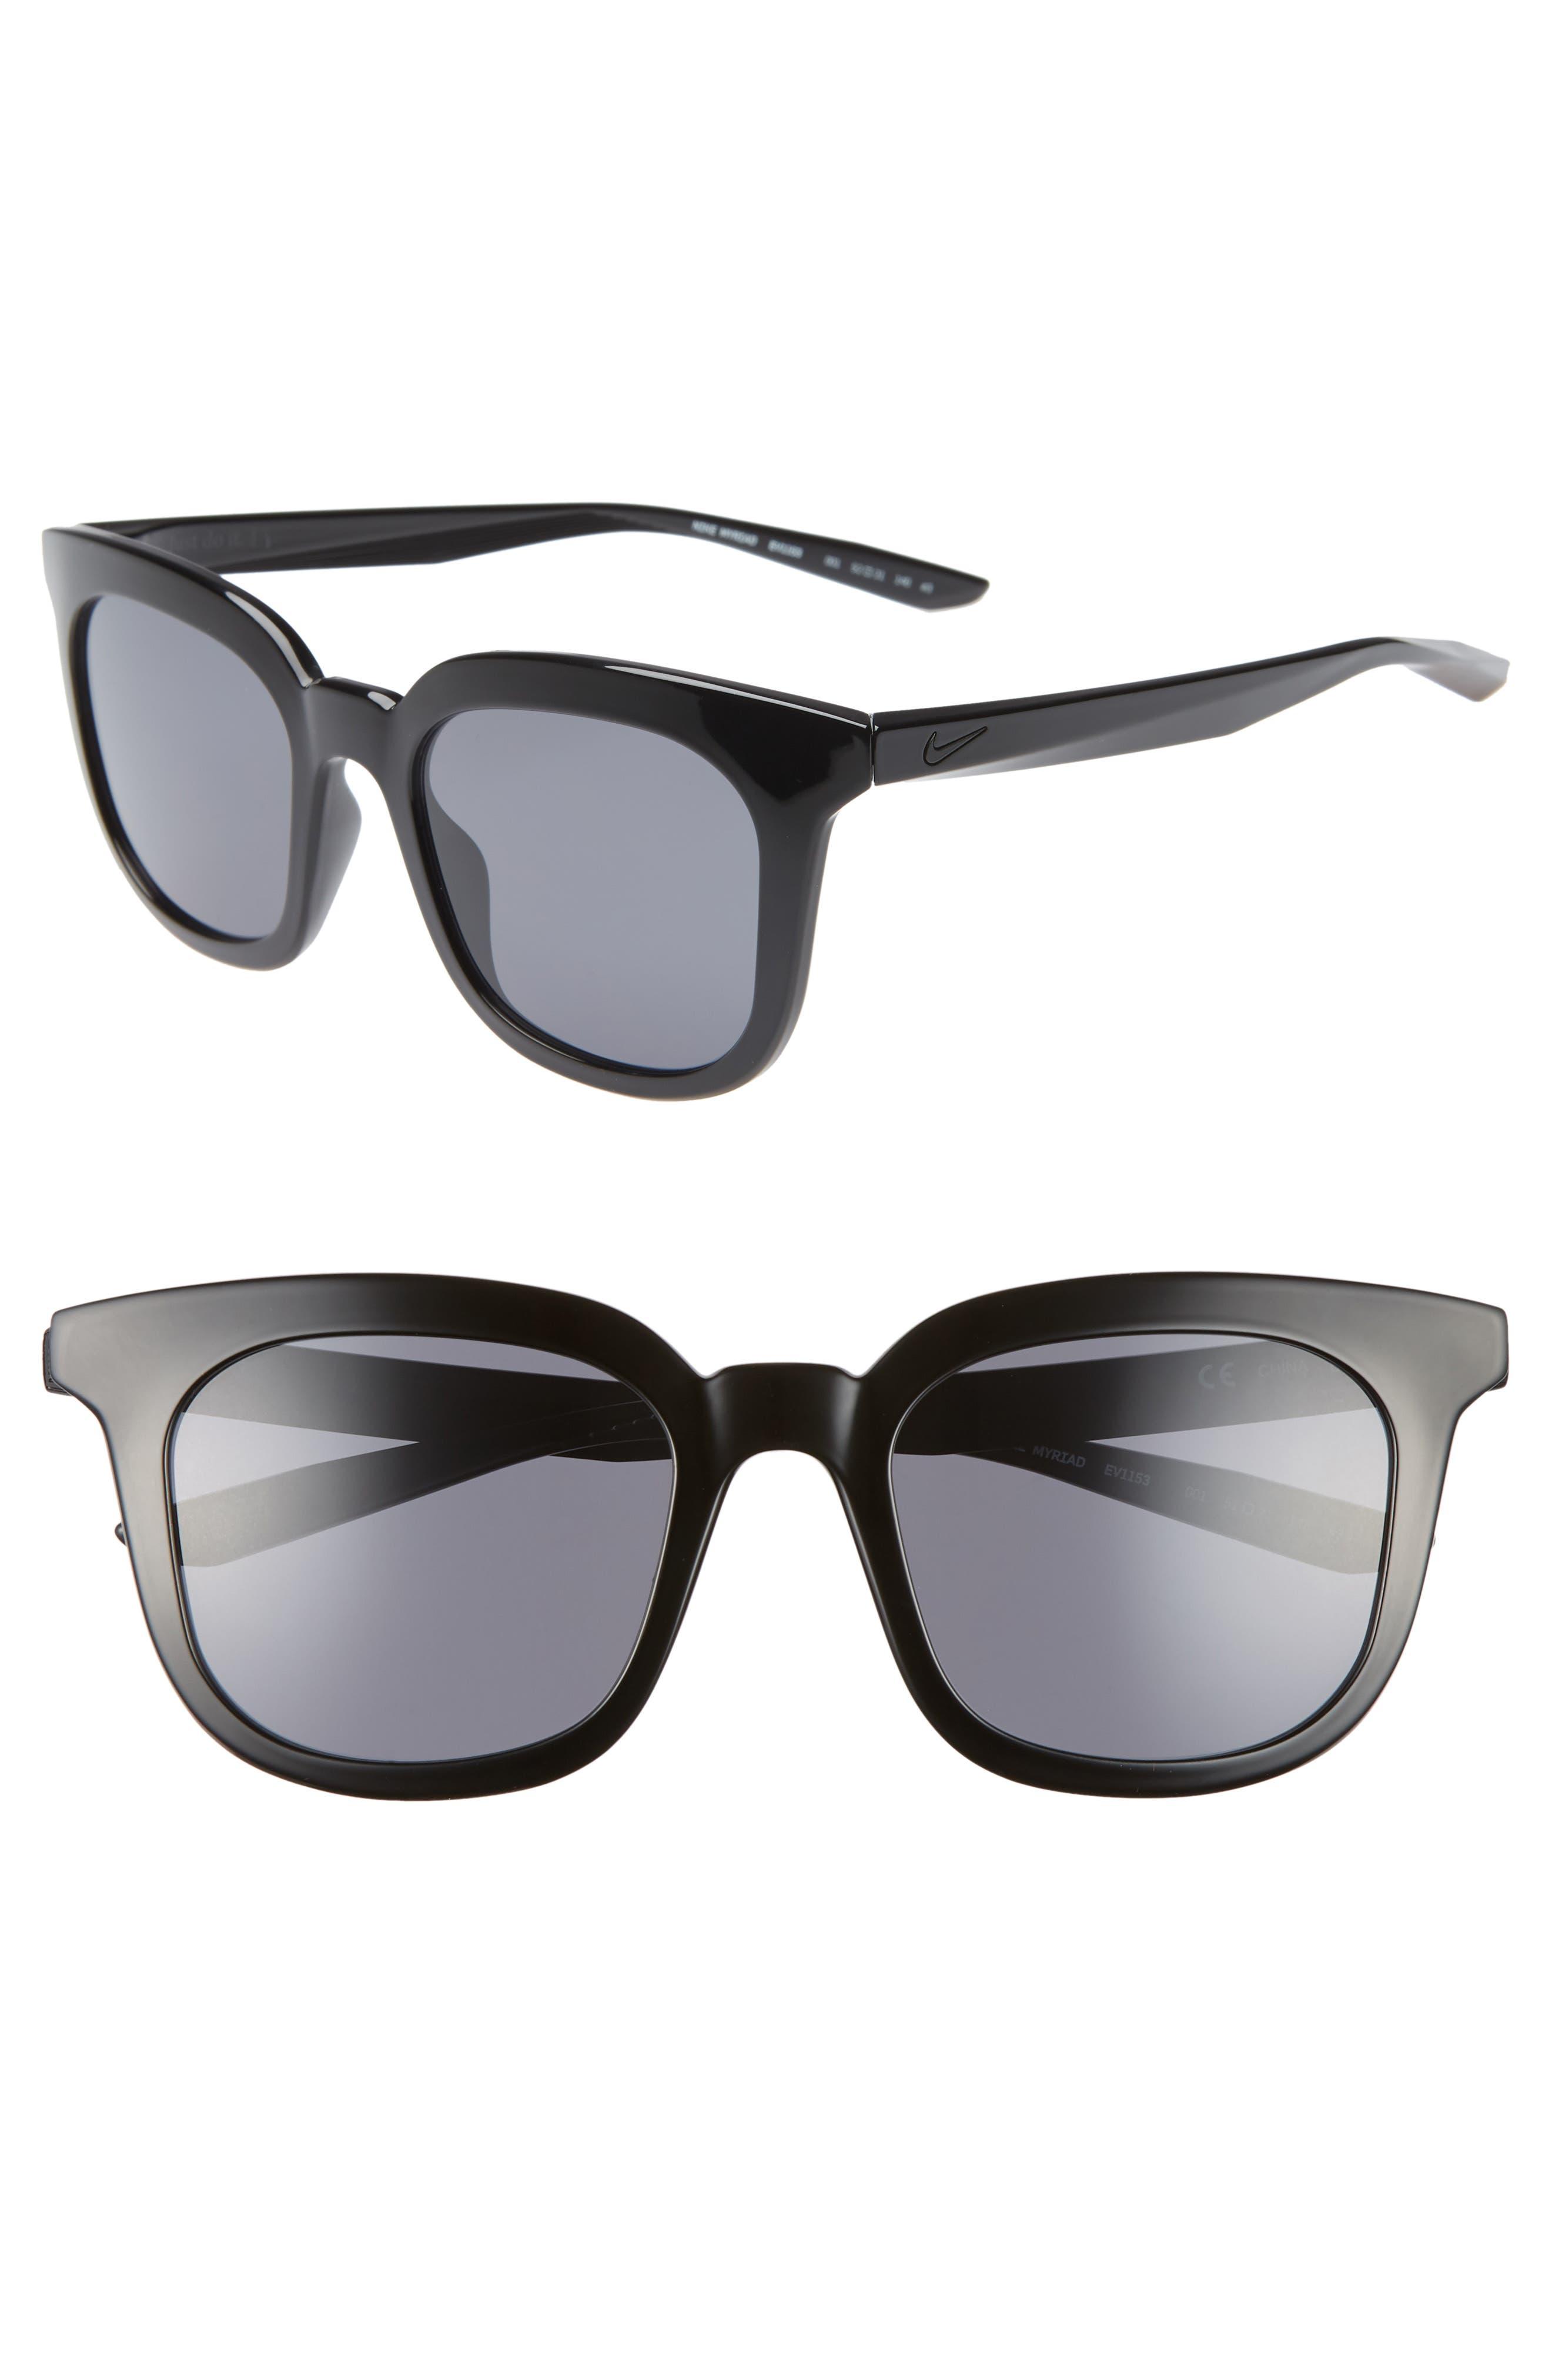 Nike Myriad 52Mm Square Sunglasses - Black/ Dark Grey